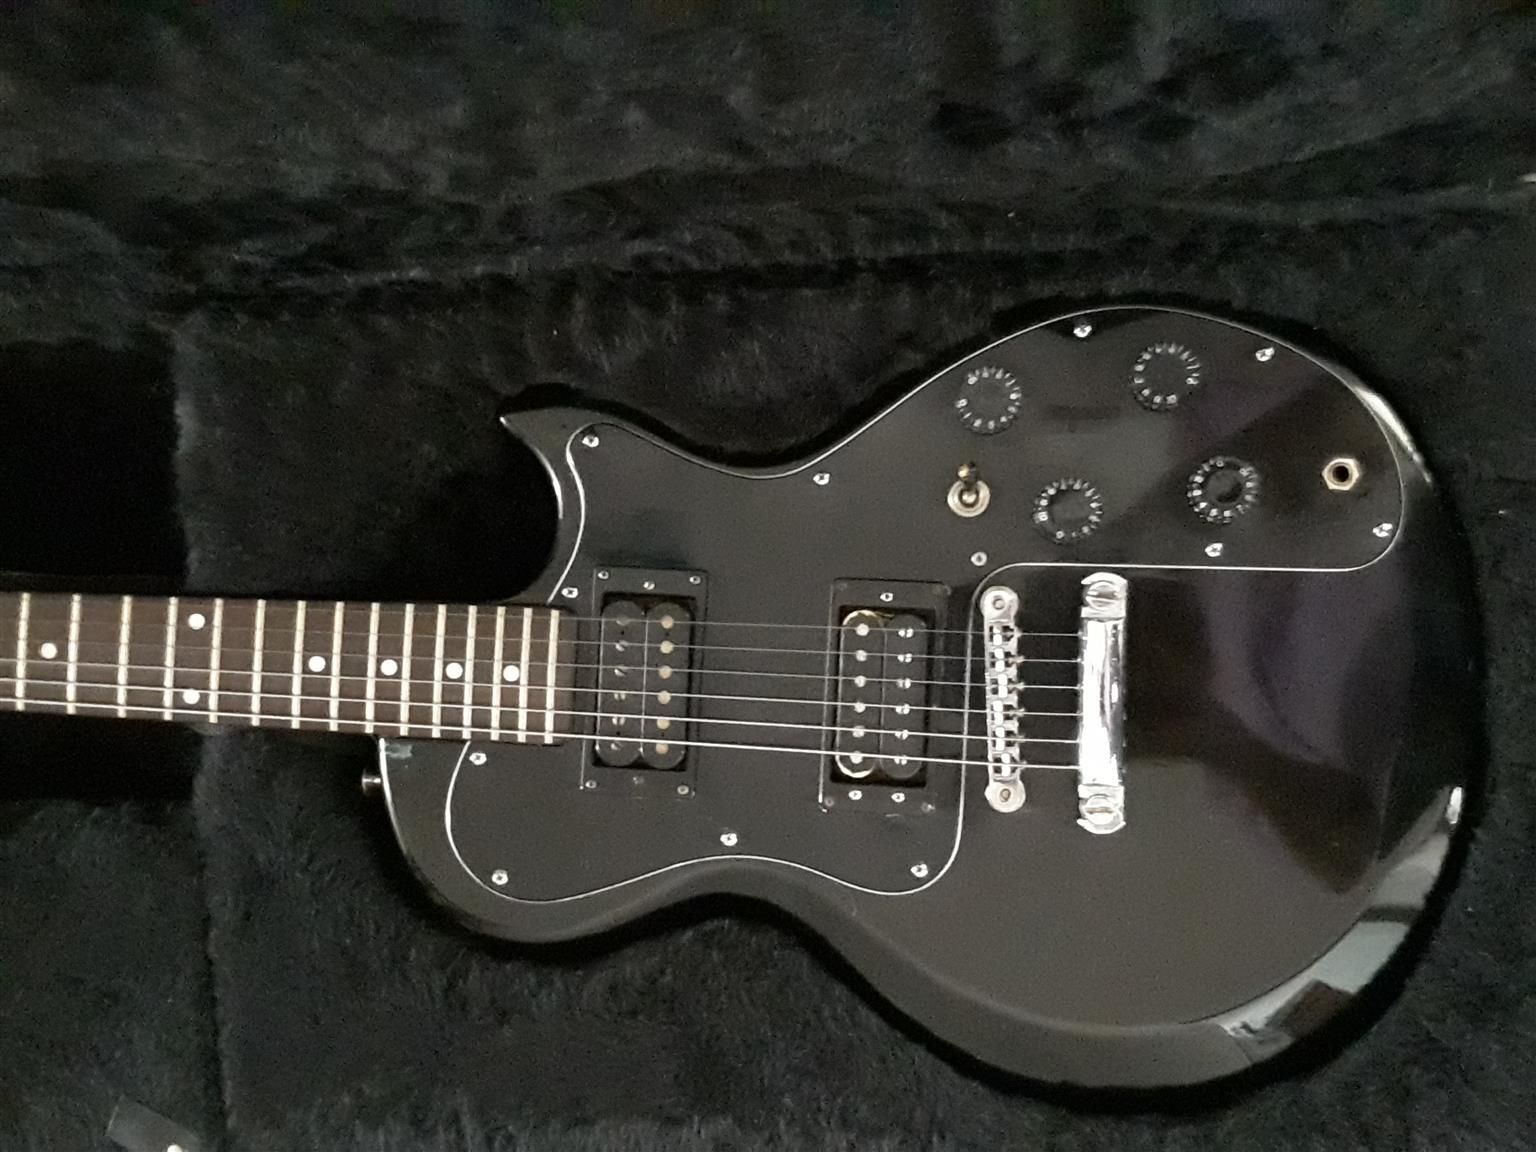 Gibson Les Paul Sonic 180 Deluxe Guitar